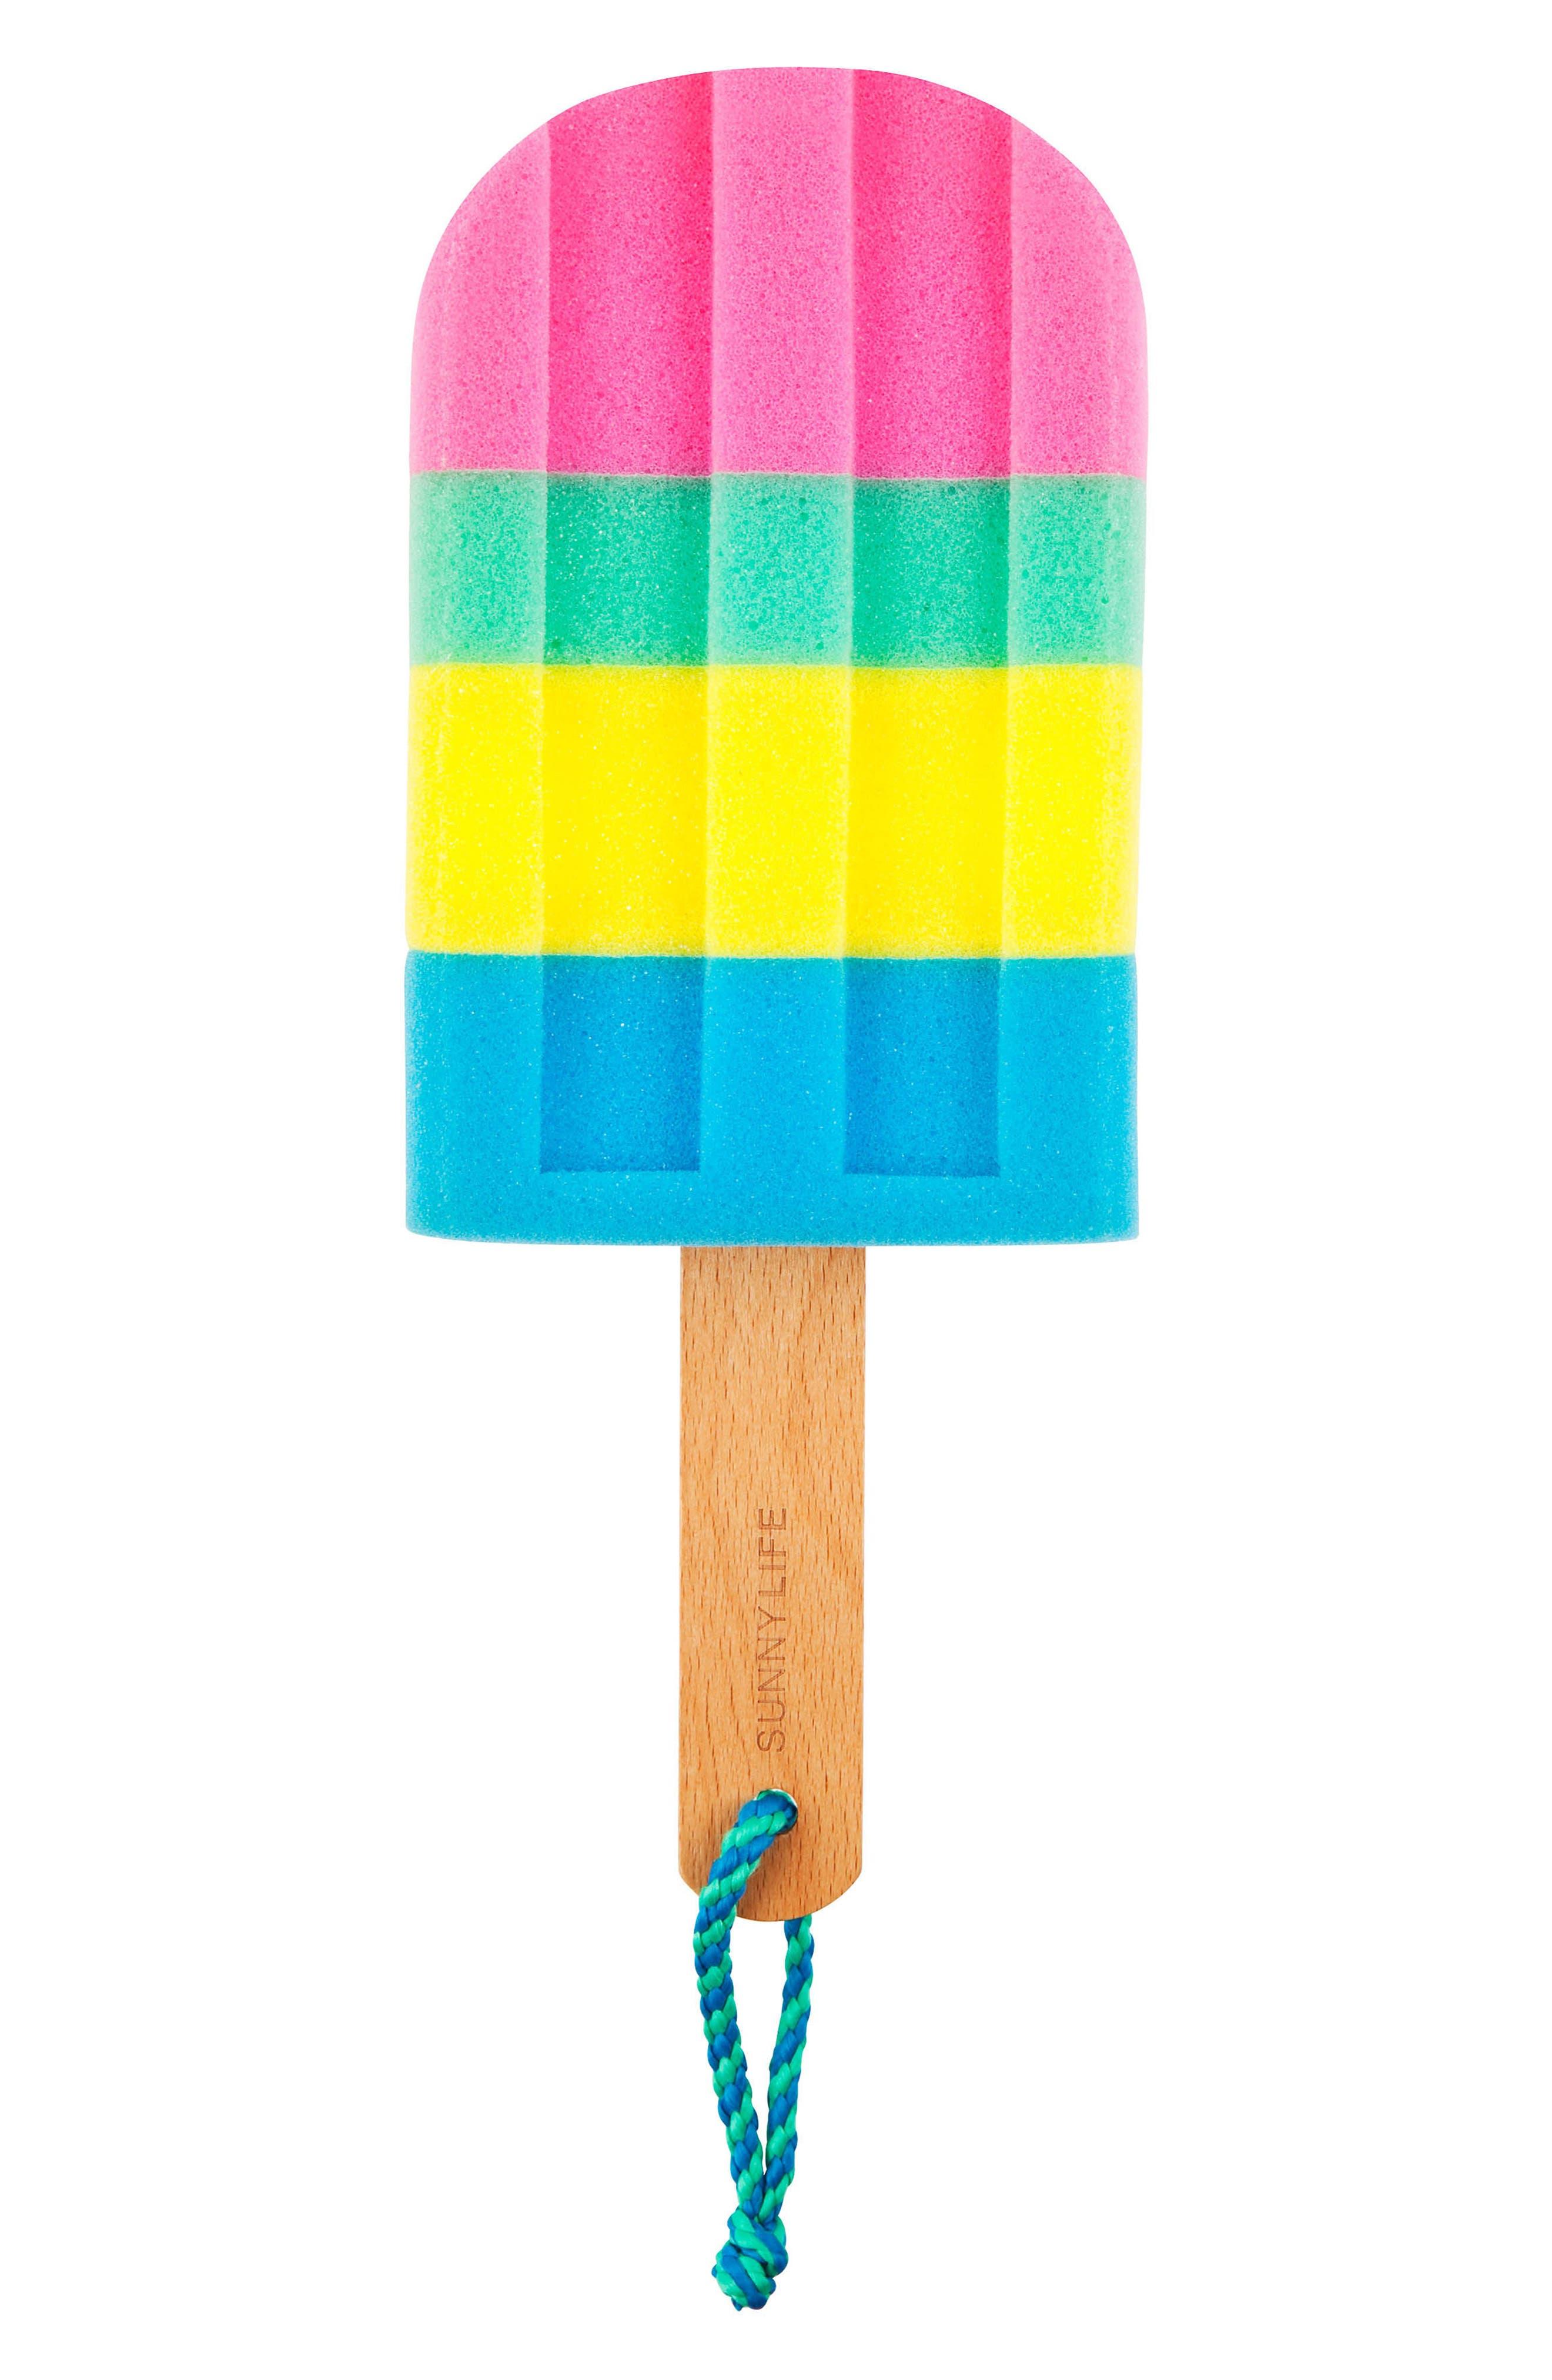 Ice Lolly Bath Sponge,                             Main thumbnail 1, color,                             Blue